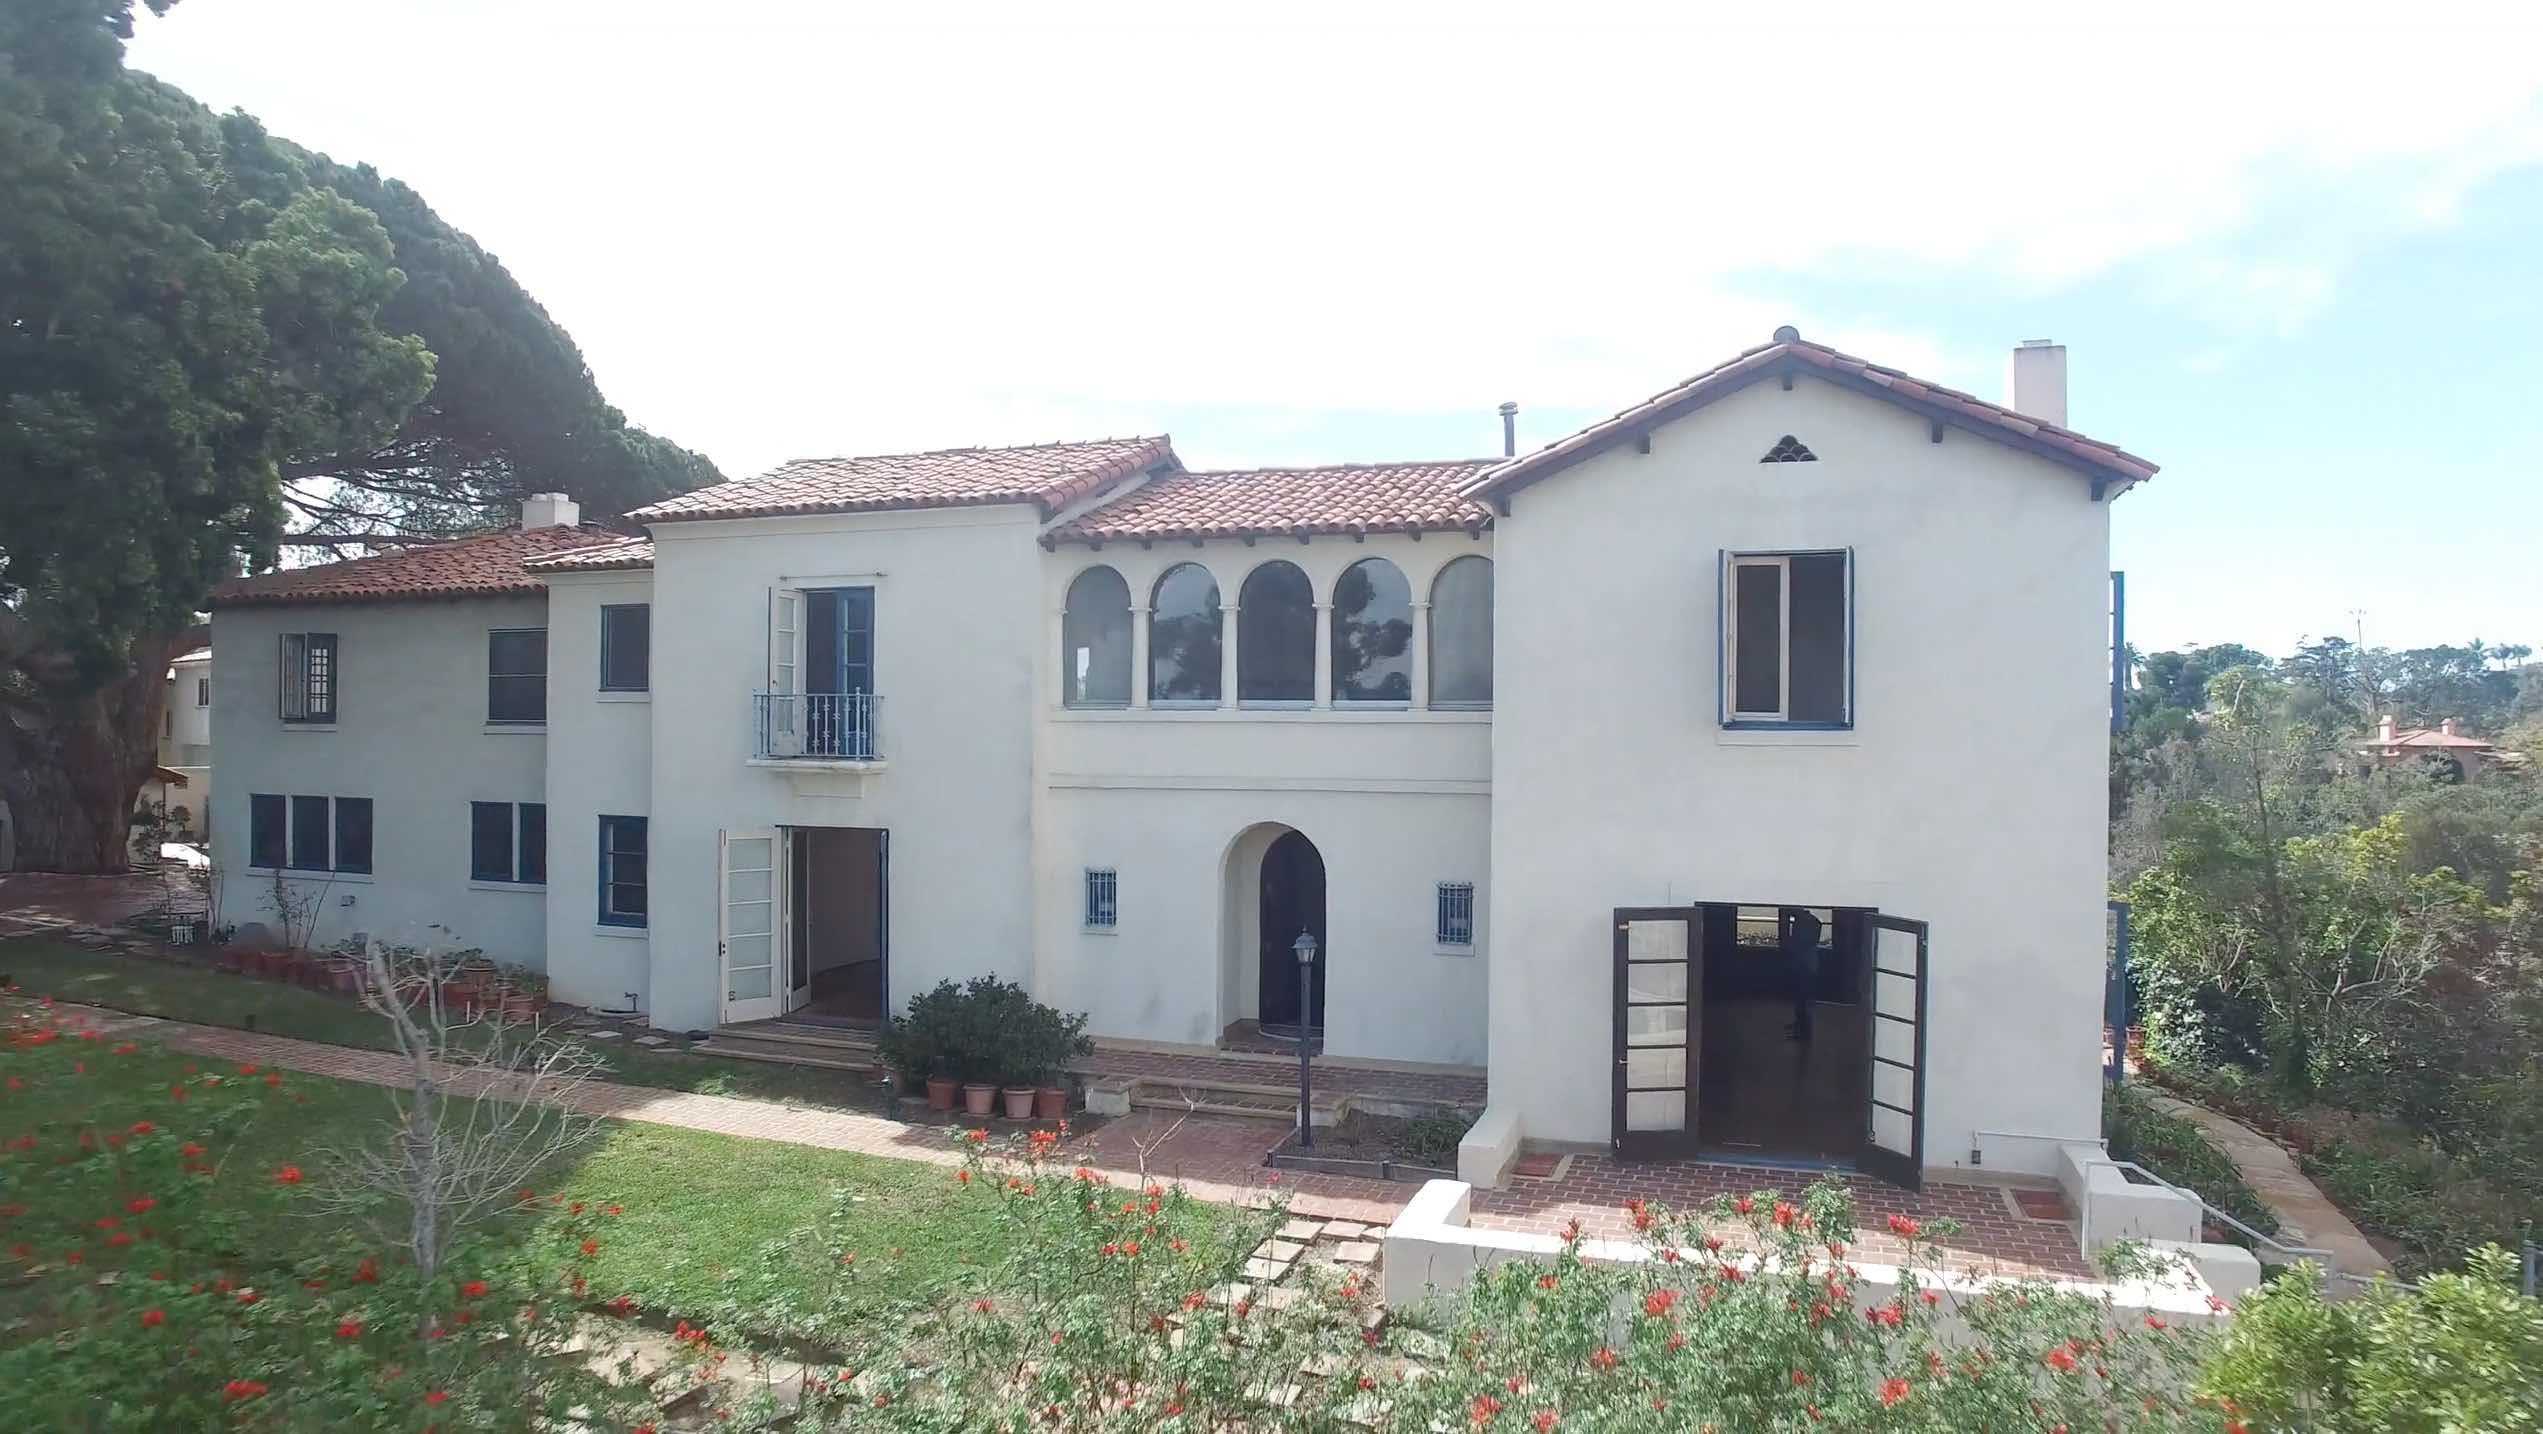 Villa-Hermosa-Aerial-16